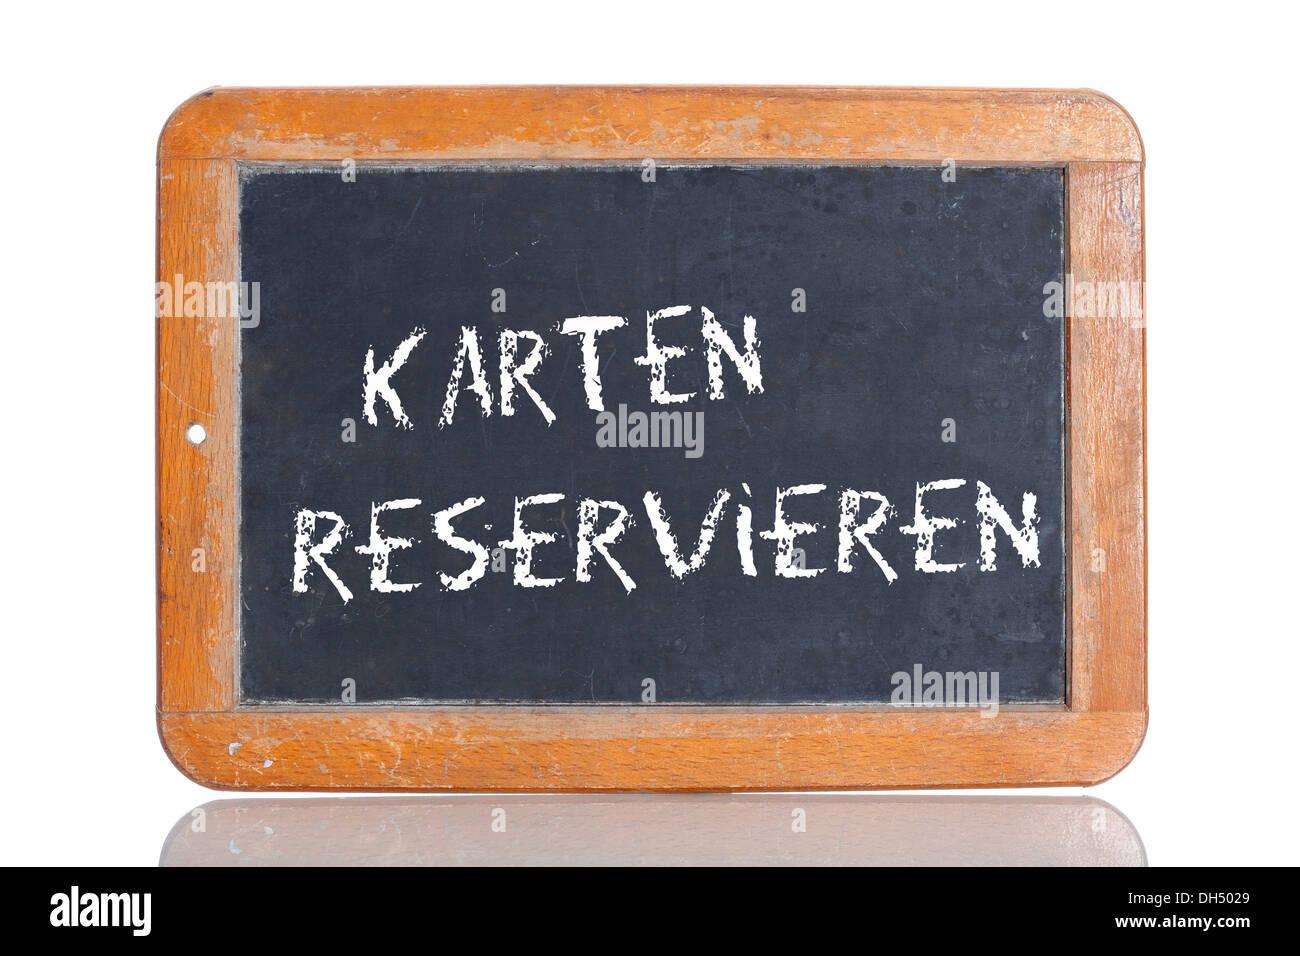 Old chalkboard, lettering 'KARTEN RESERVIEREN', German for 'BOOK TICKETS' - Stock Image